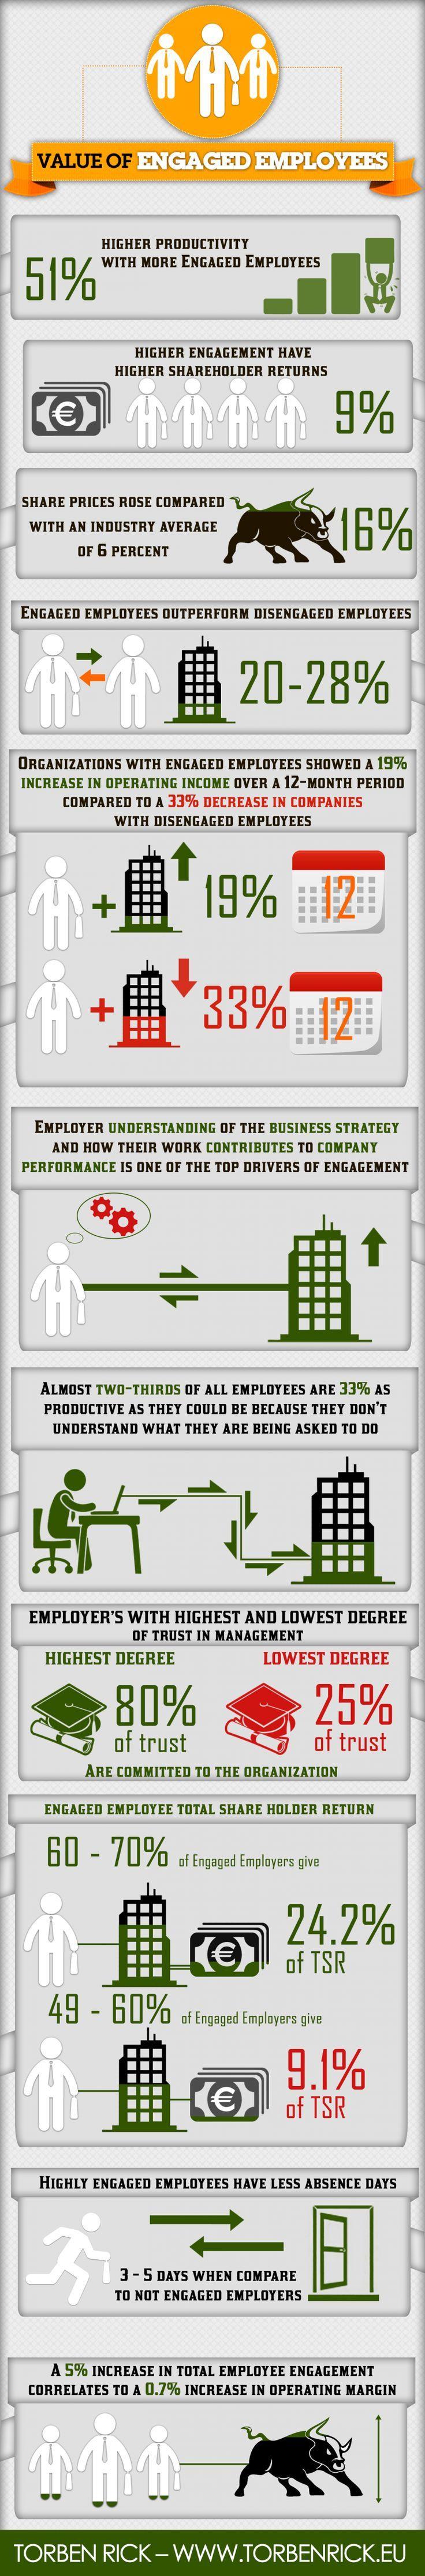 Value of Engaged Employees